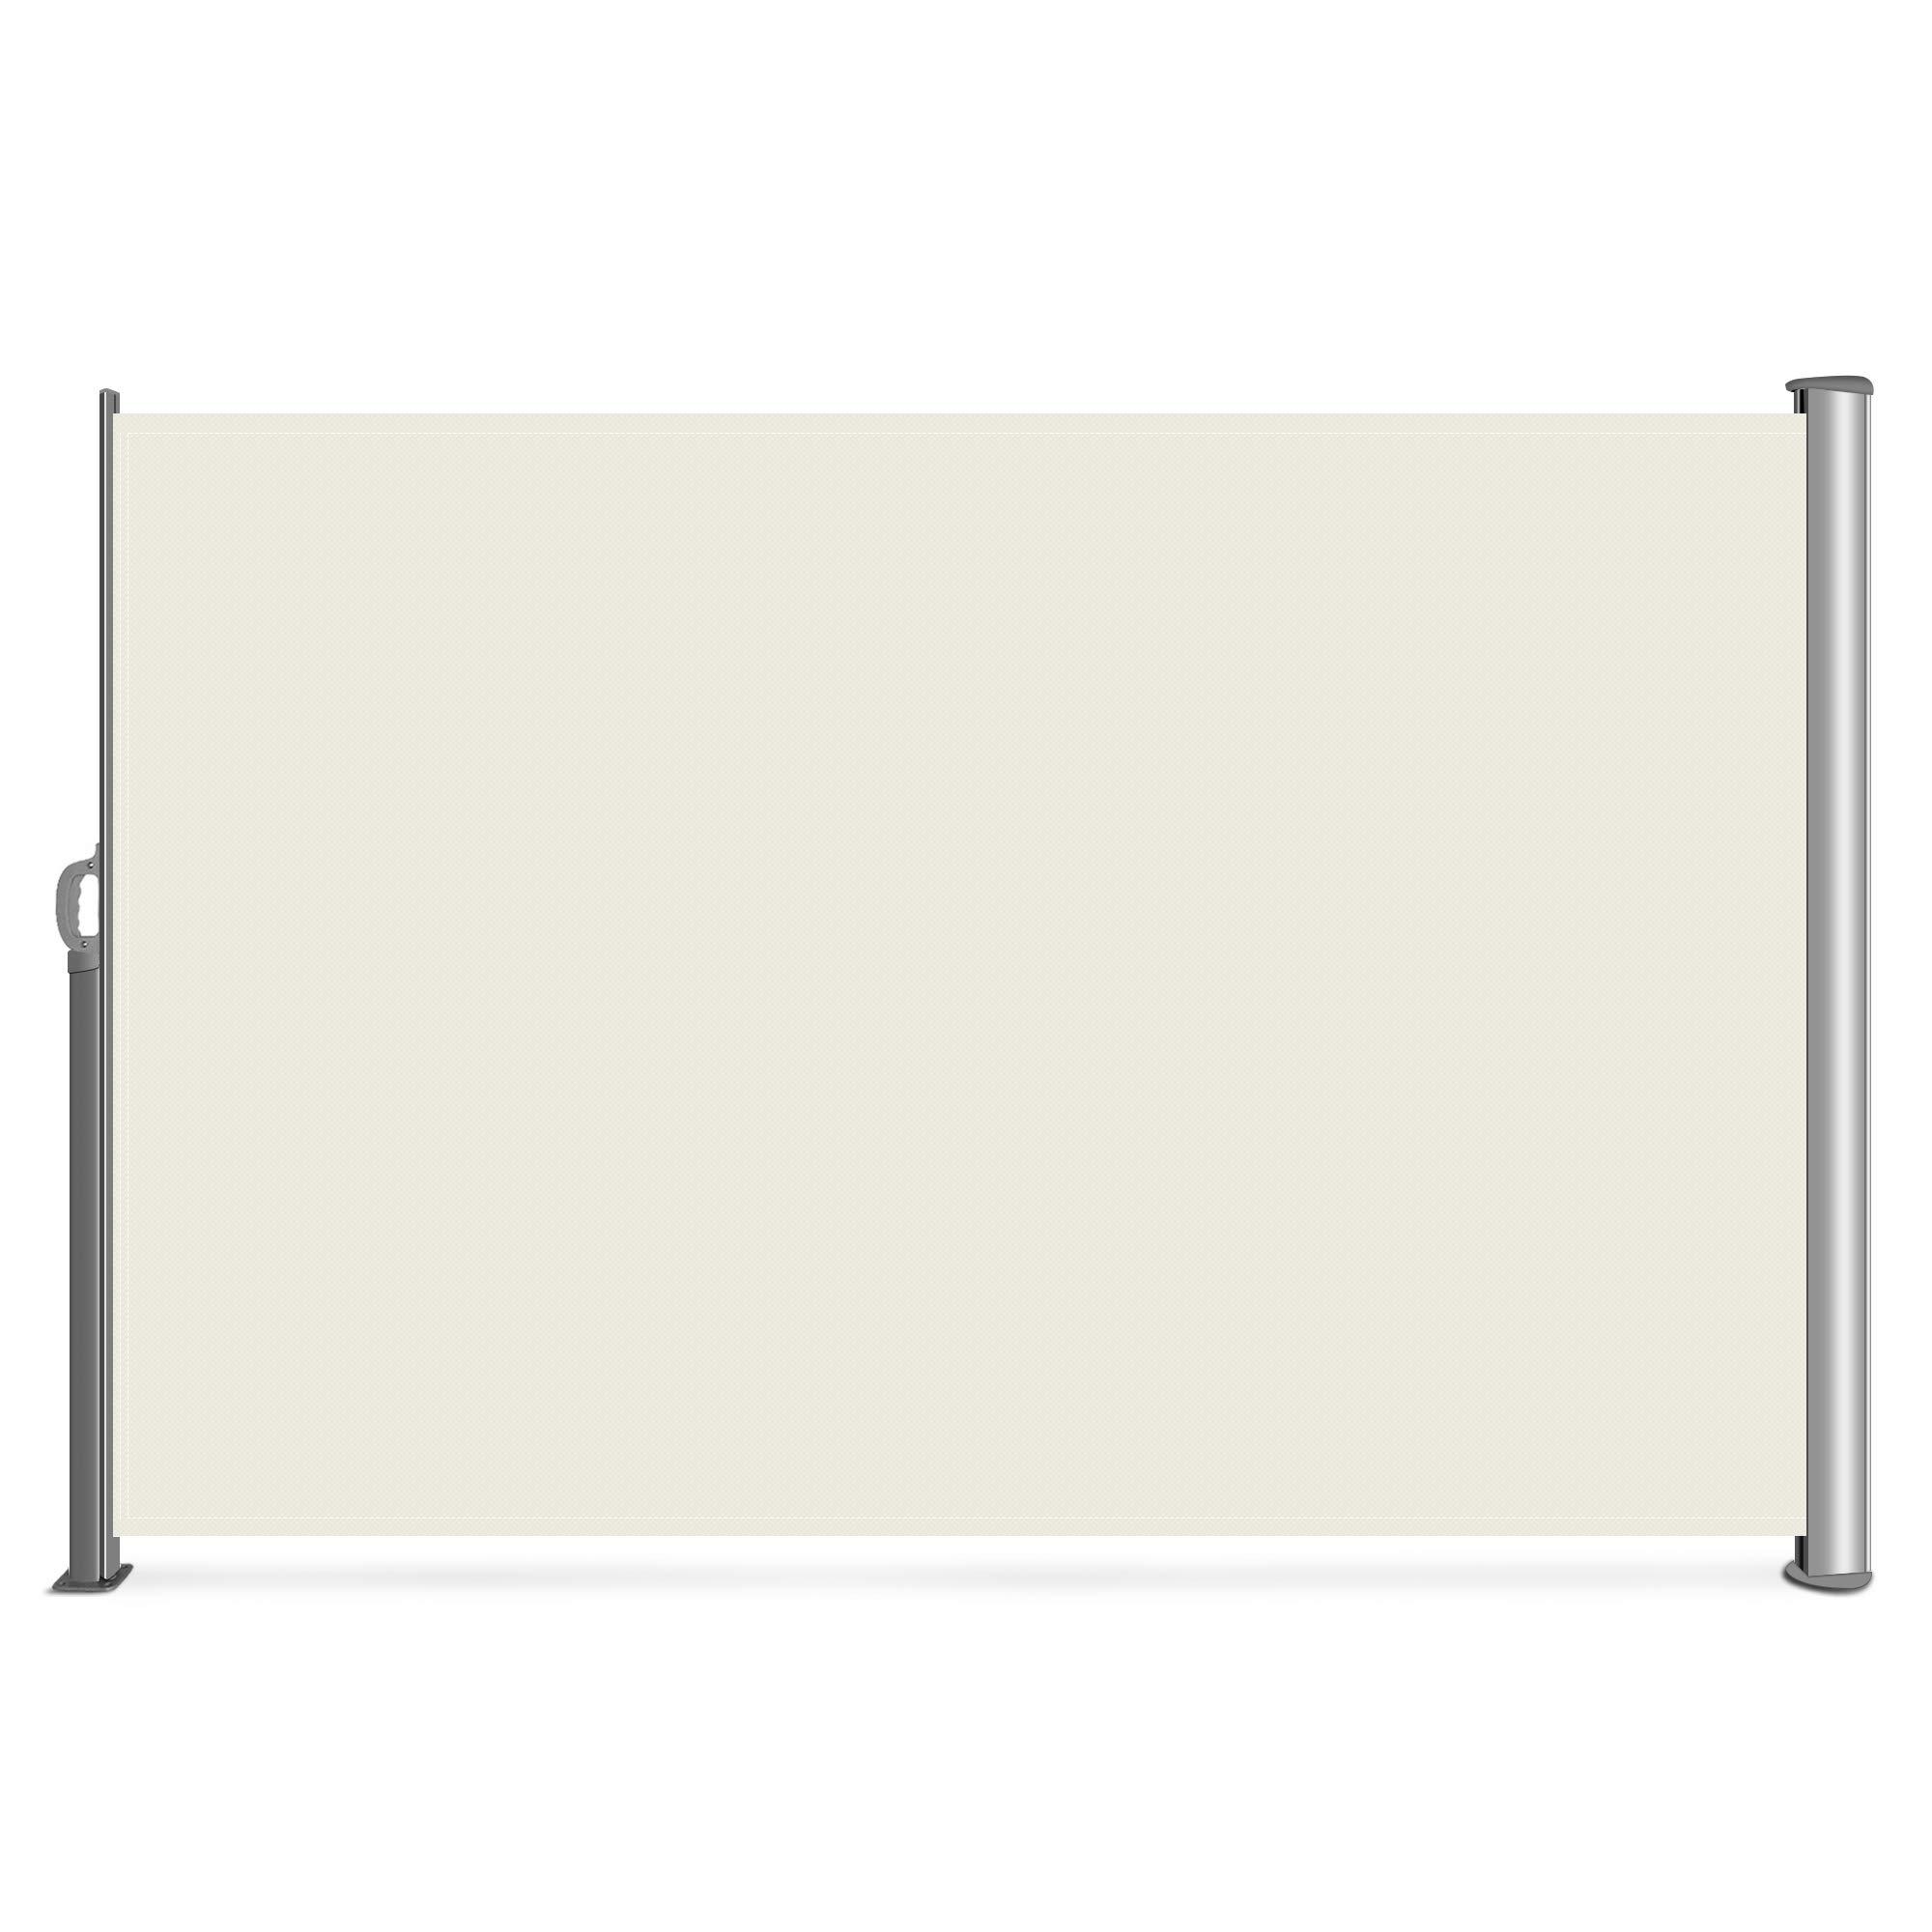 Belleze Retractable Side Awning Patio Waterproof Sun Shade Screen Divider w/Handle (9.8 x 5.2ft), Beige